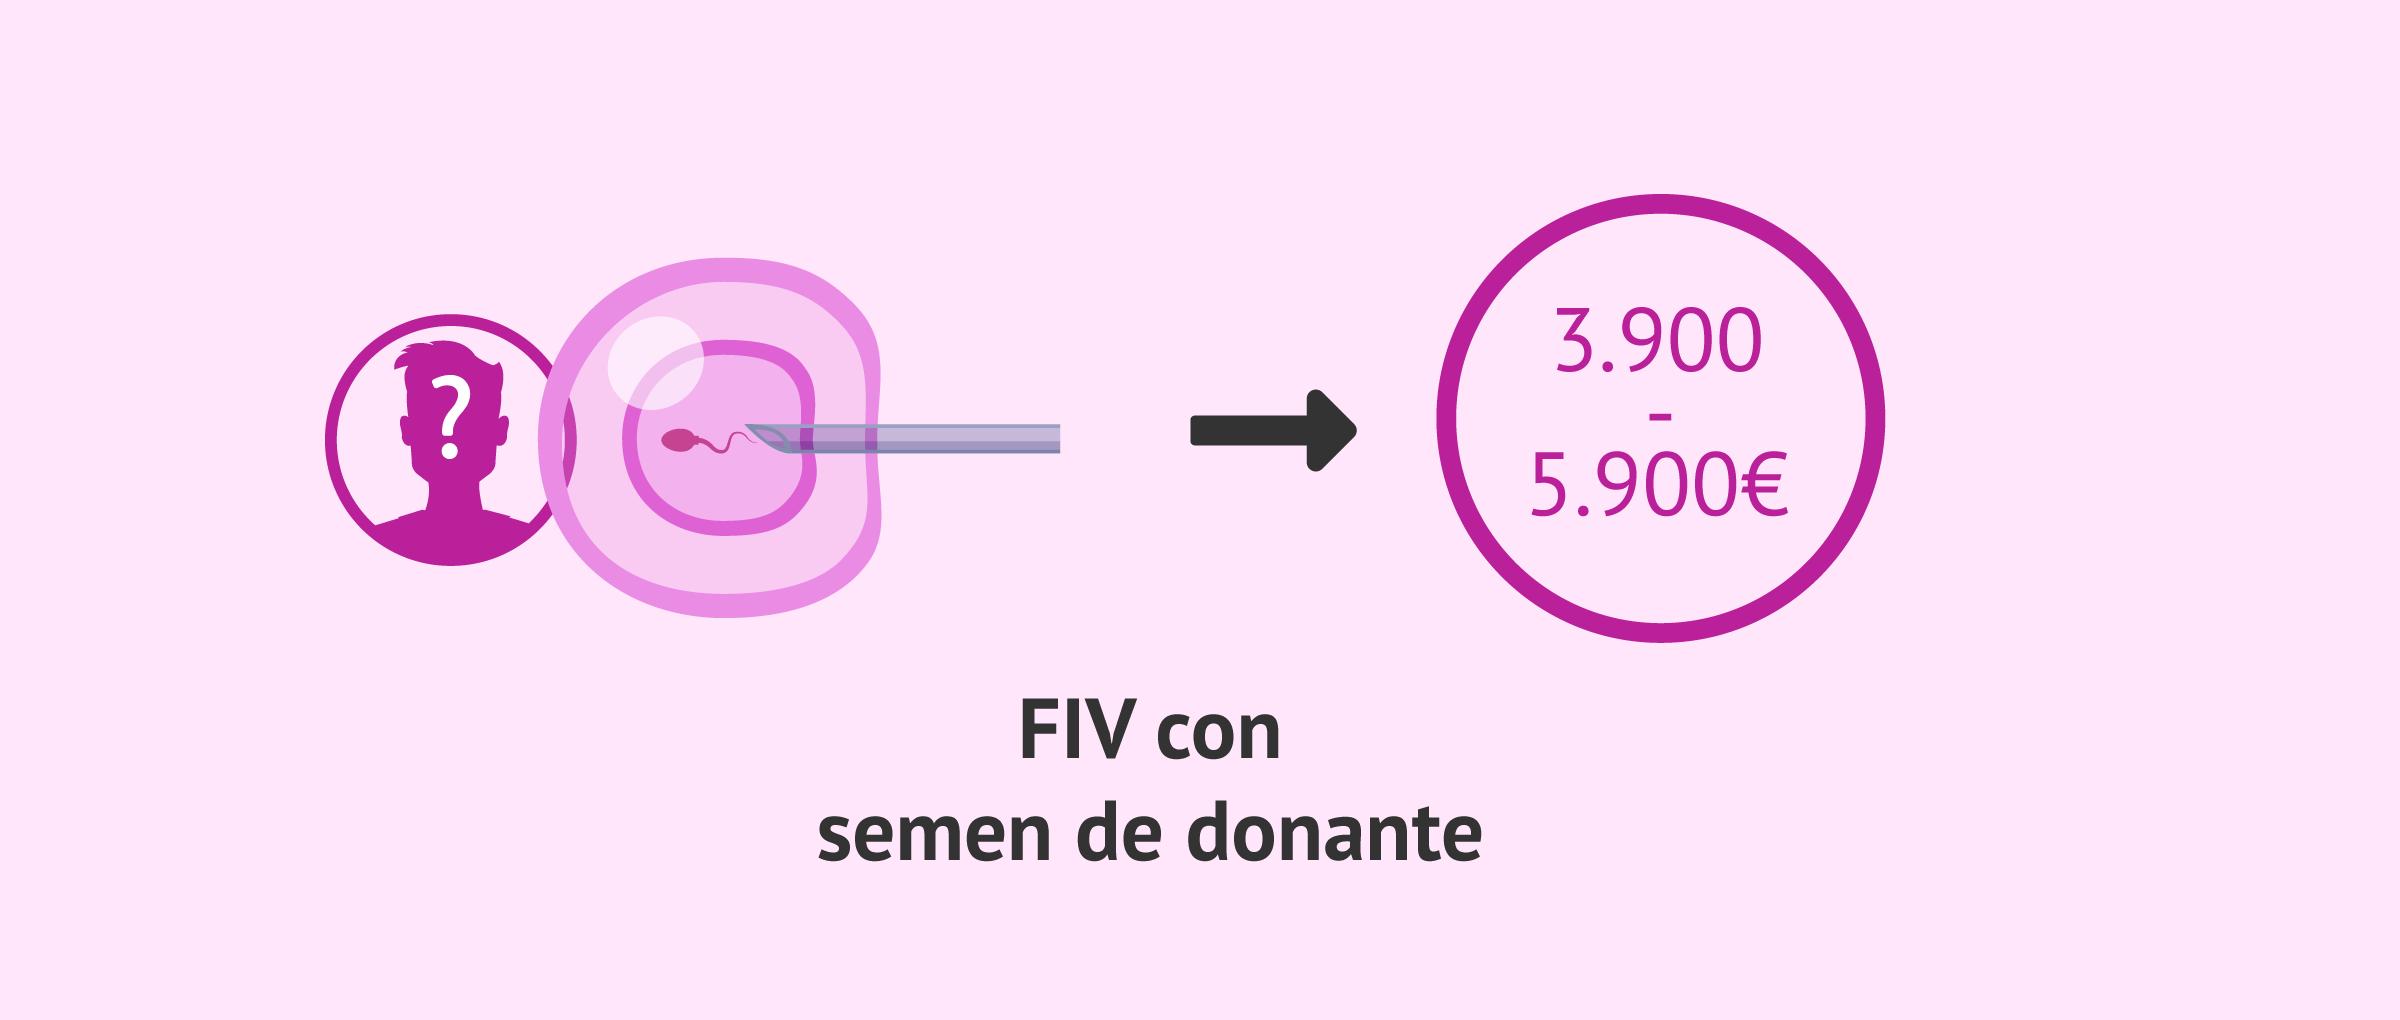 Precio de la FIV con espermatozoides de donante